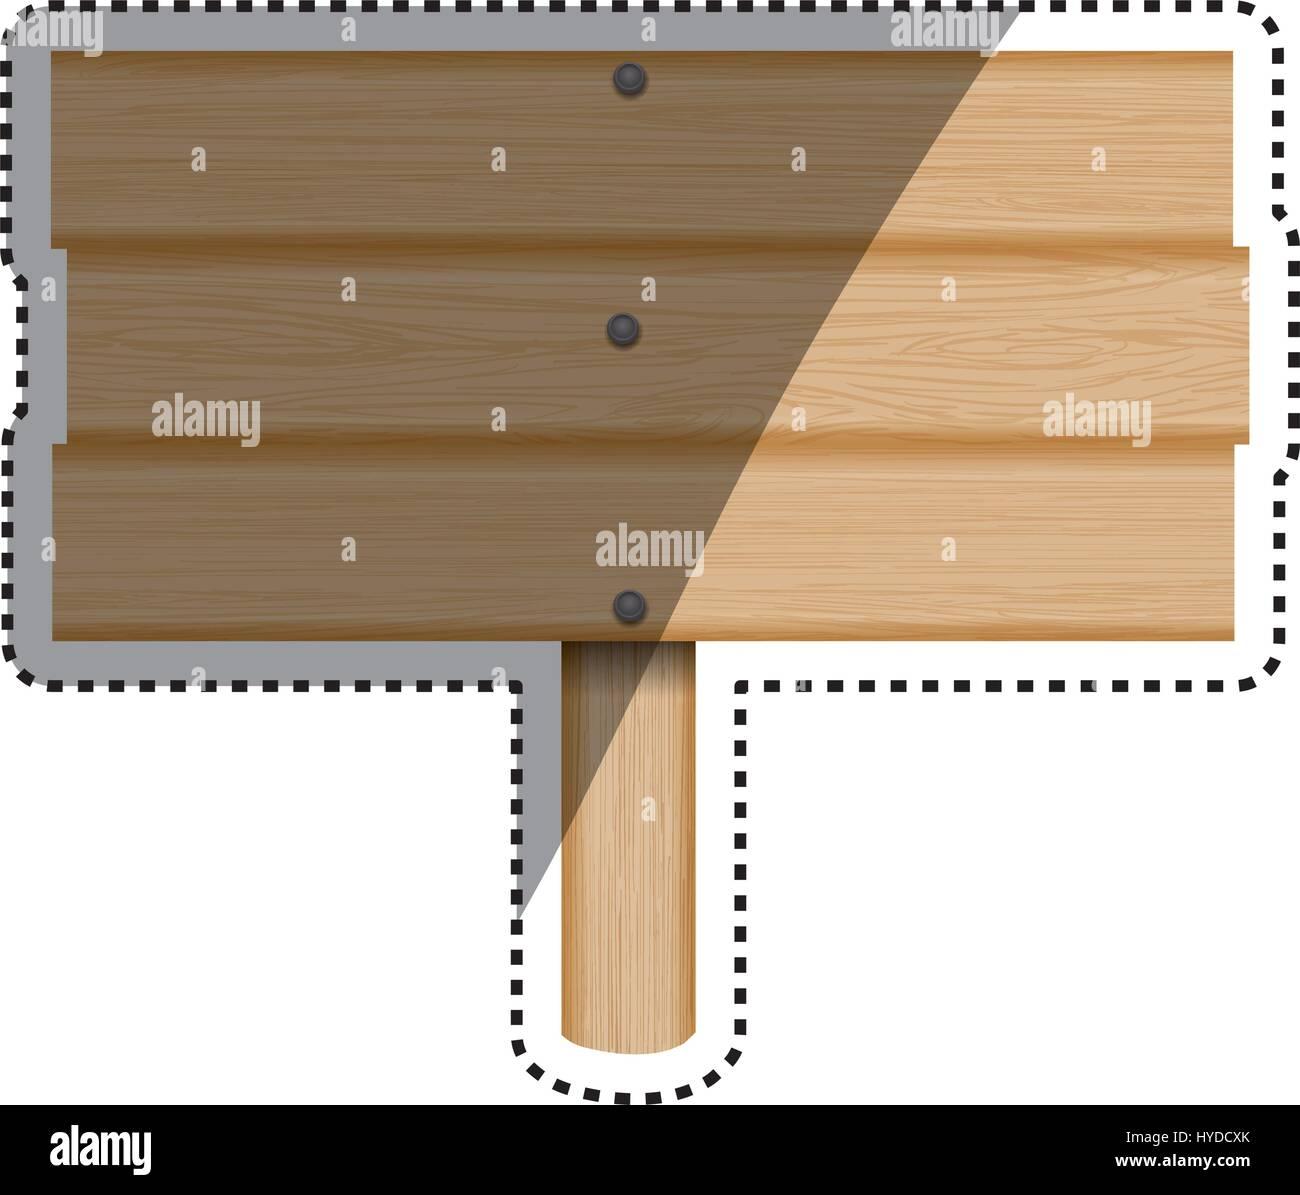 Firmar los tablones de madera de madera Imagen De Stock